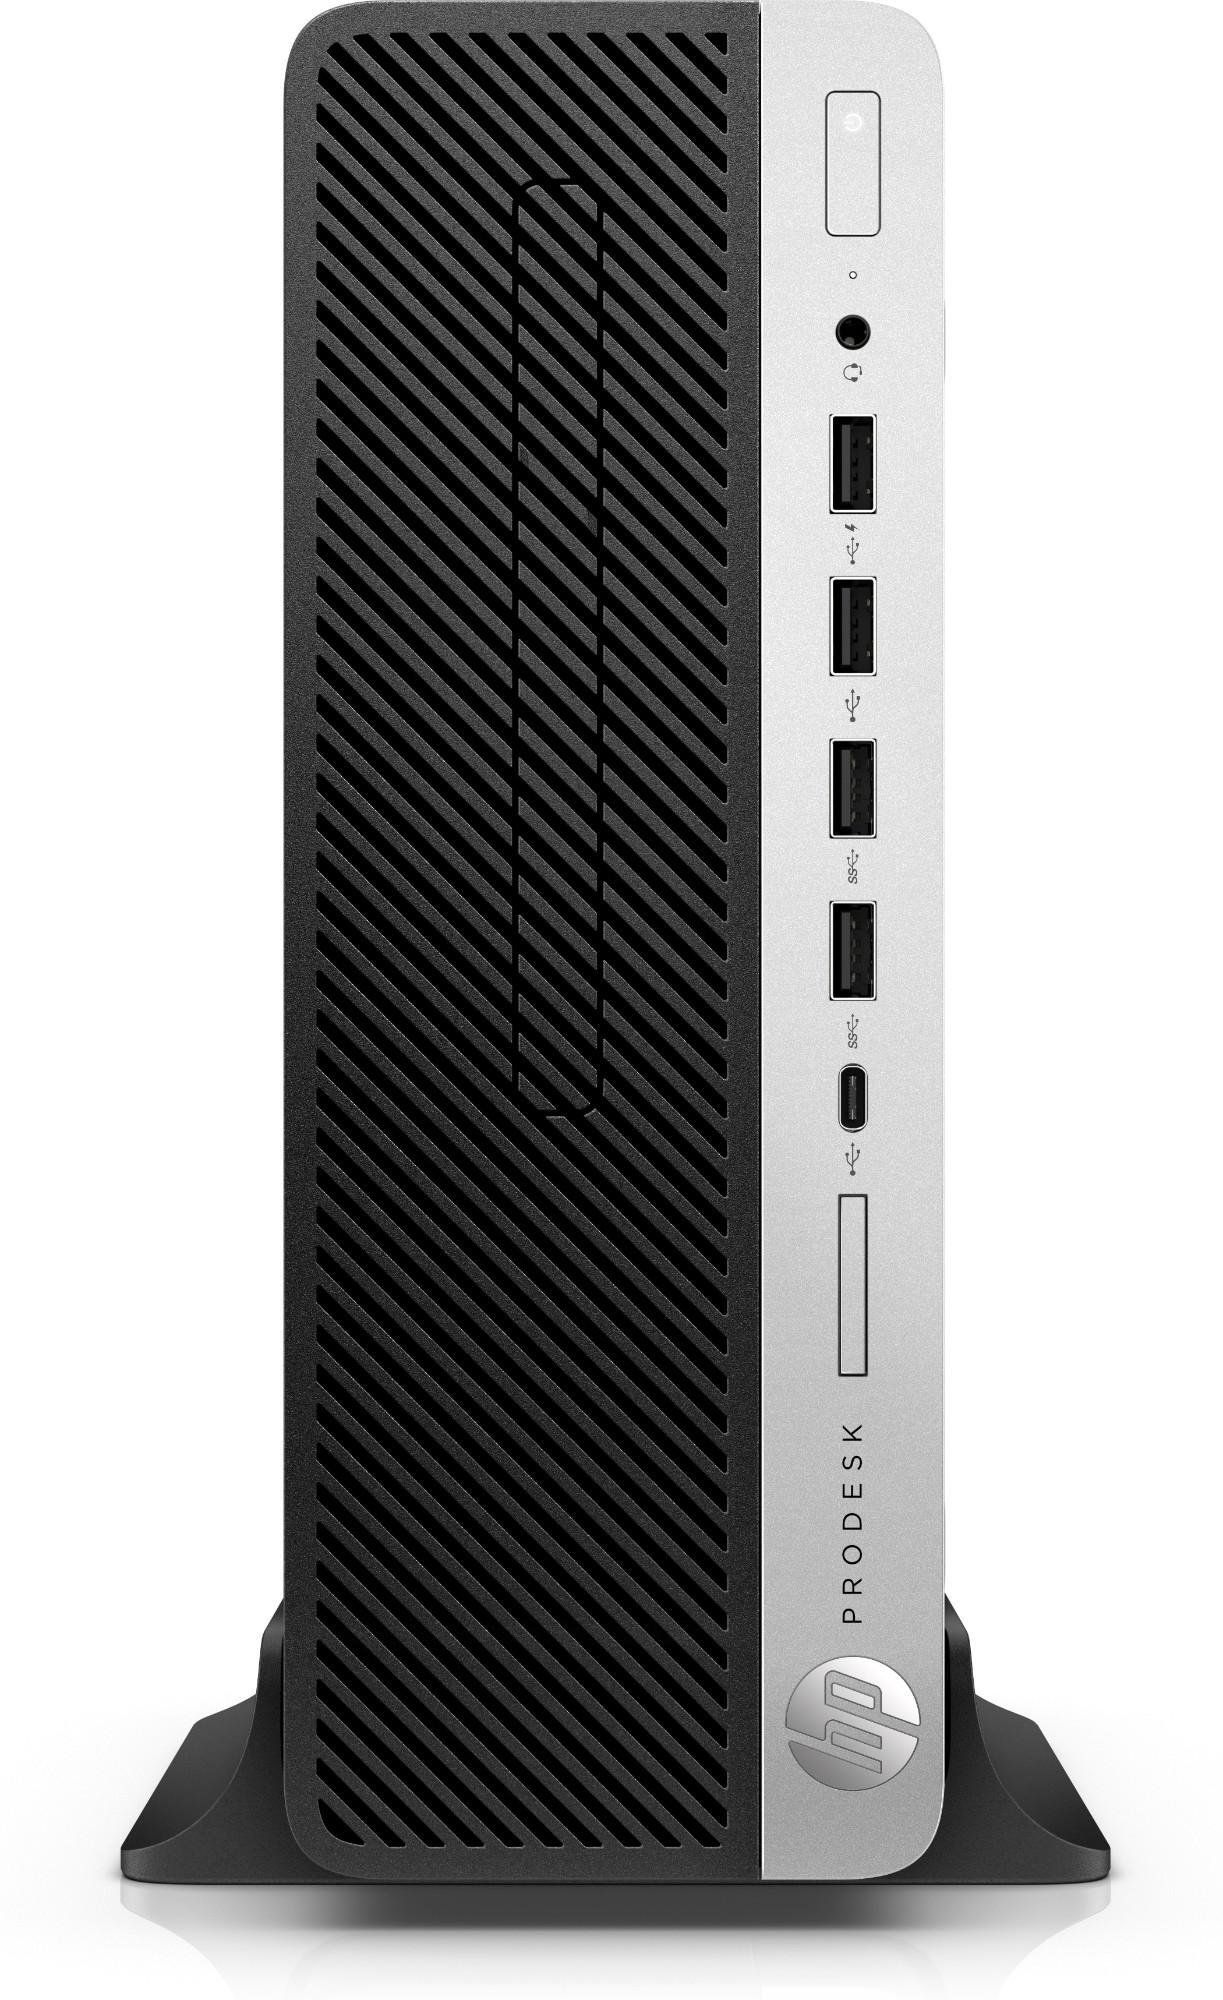 HP ProDesk 600 G4 8th gen Intel® Core™ i5 i5-8500 8 GB DDR4-SDRAM 500 GB HDD Black SFF PC